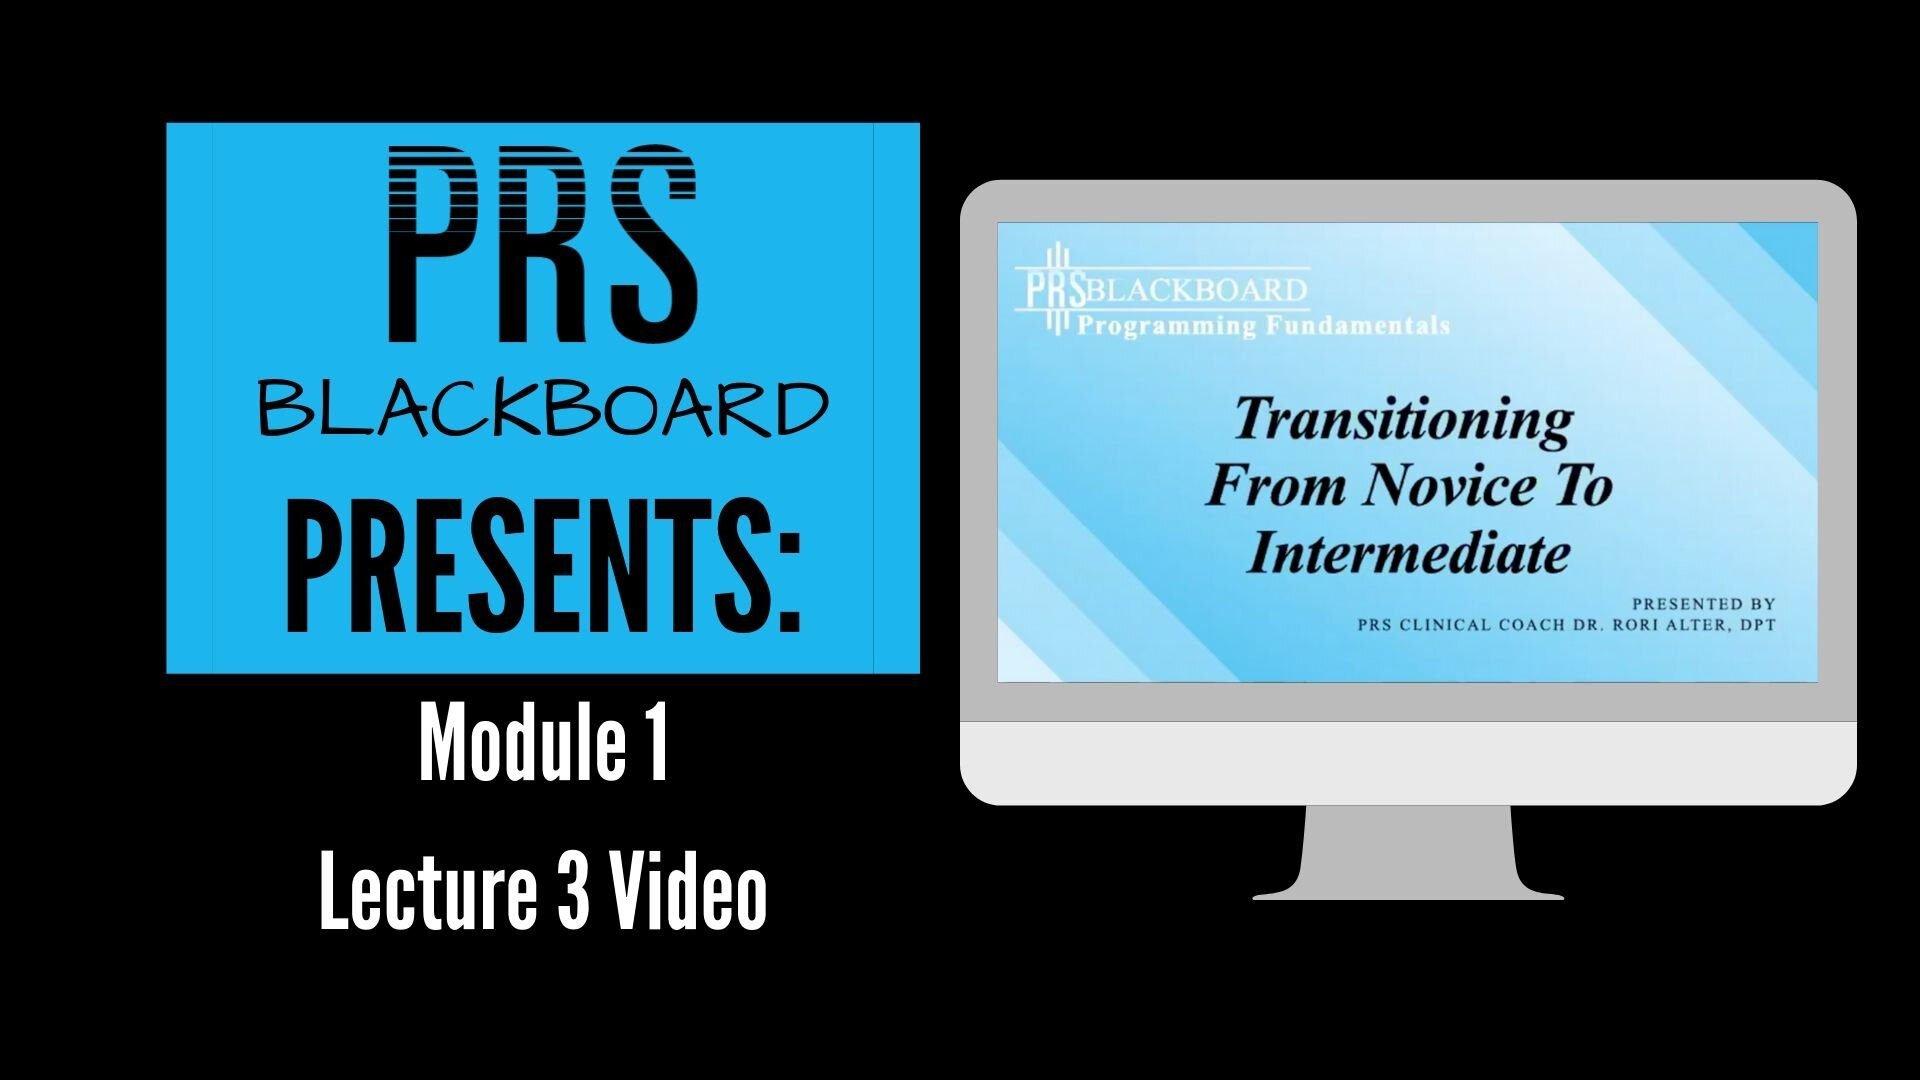 Blackboard lecture 3 Thumbnail.jpg